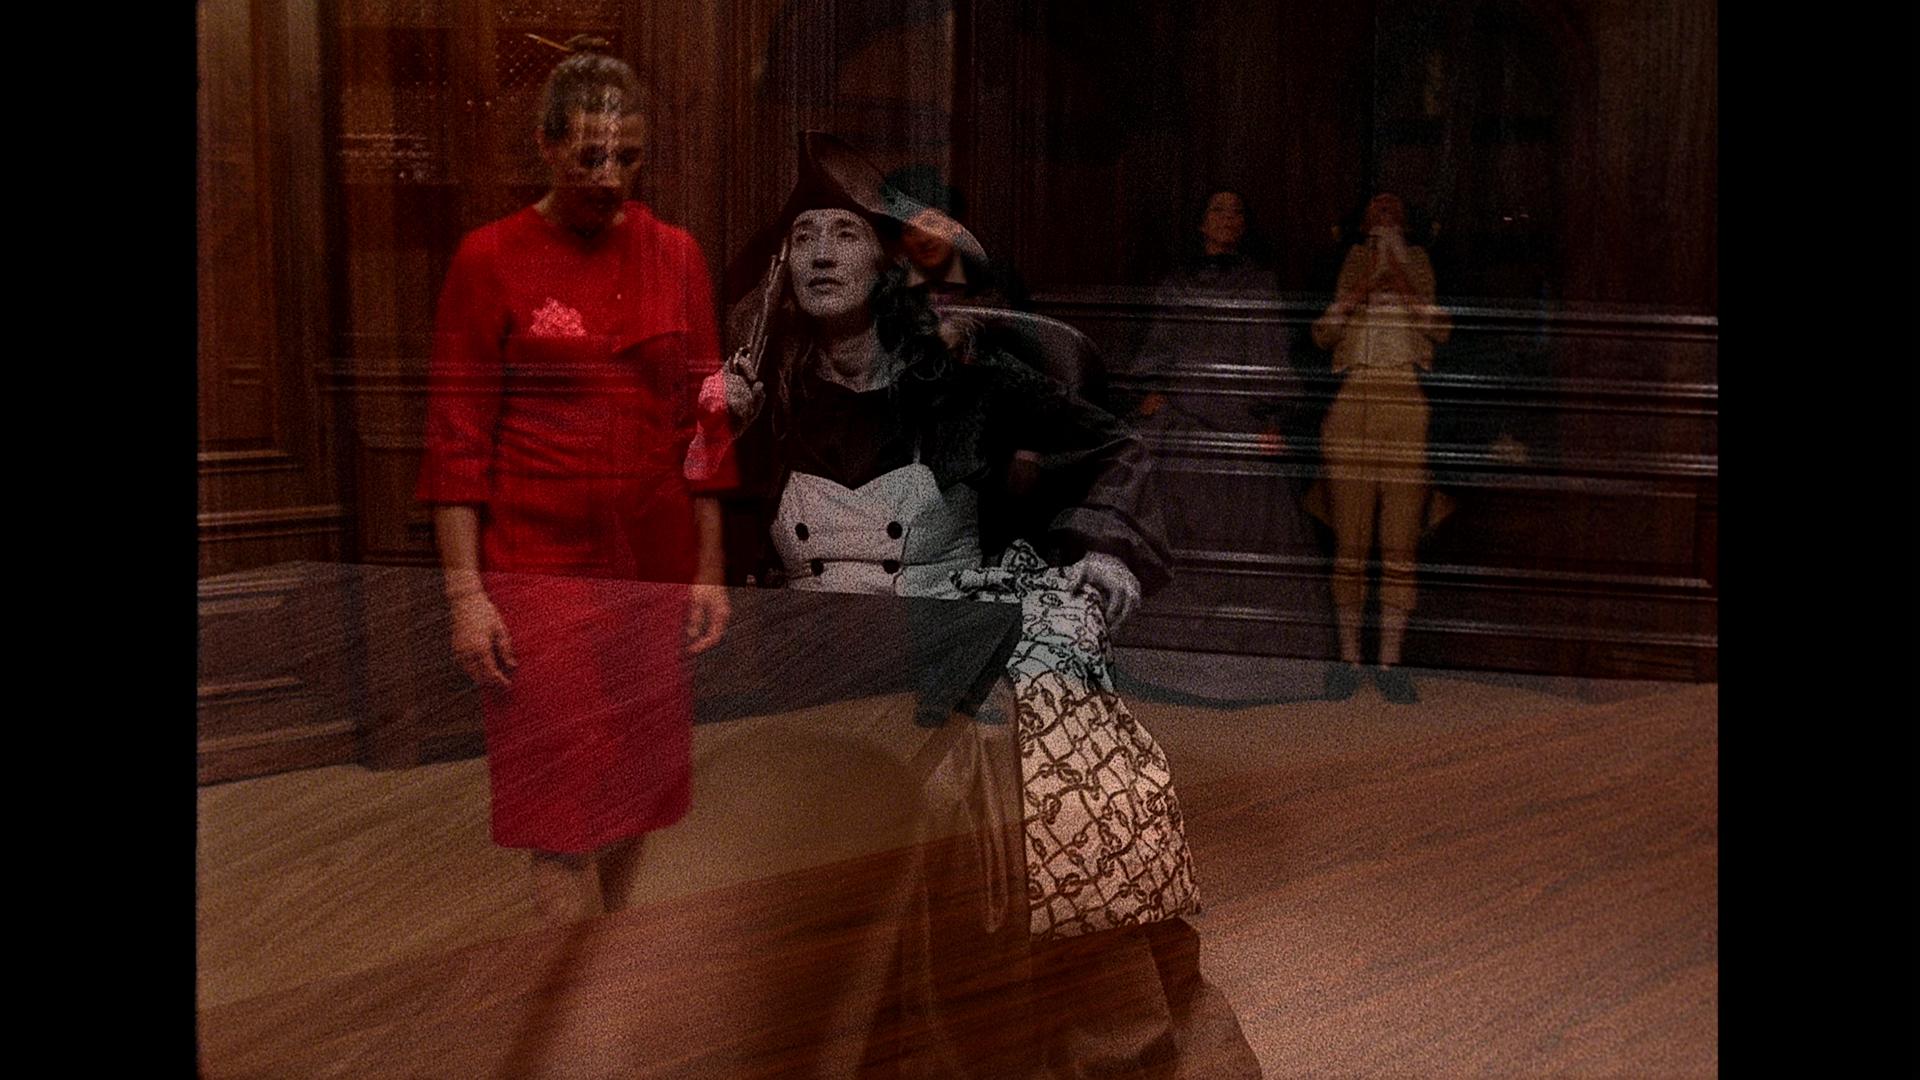 Catherine Sullivan,  The Chittendens , 2005, 6 channel video installation transferred from 16mm film 2/4', Black & White/Colour, sound (16mm film stills)